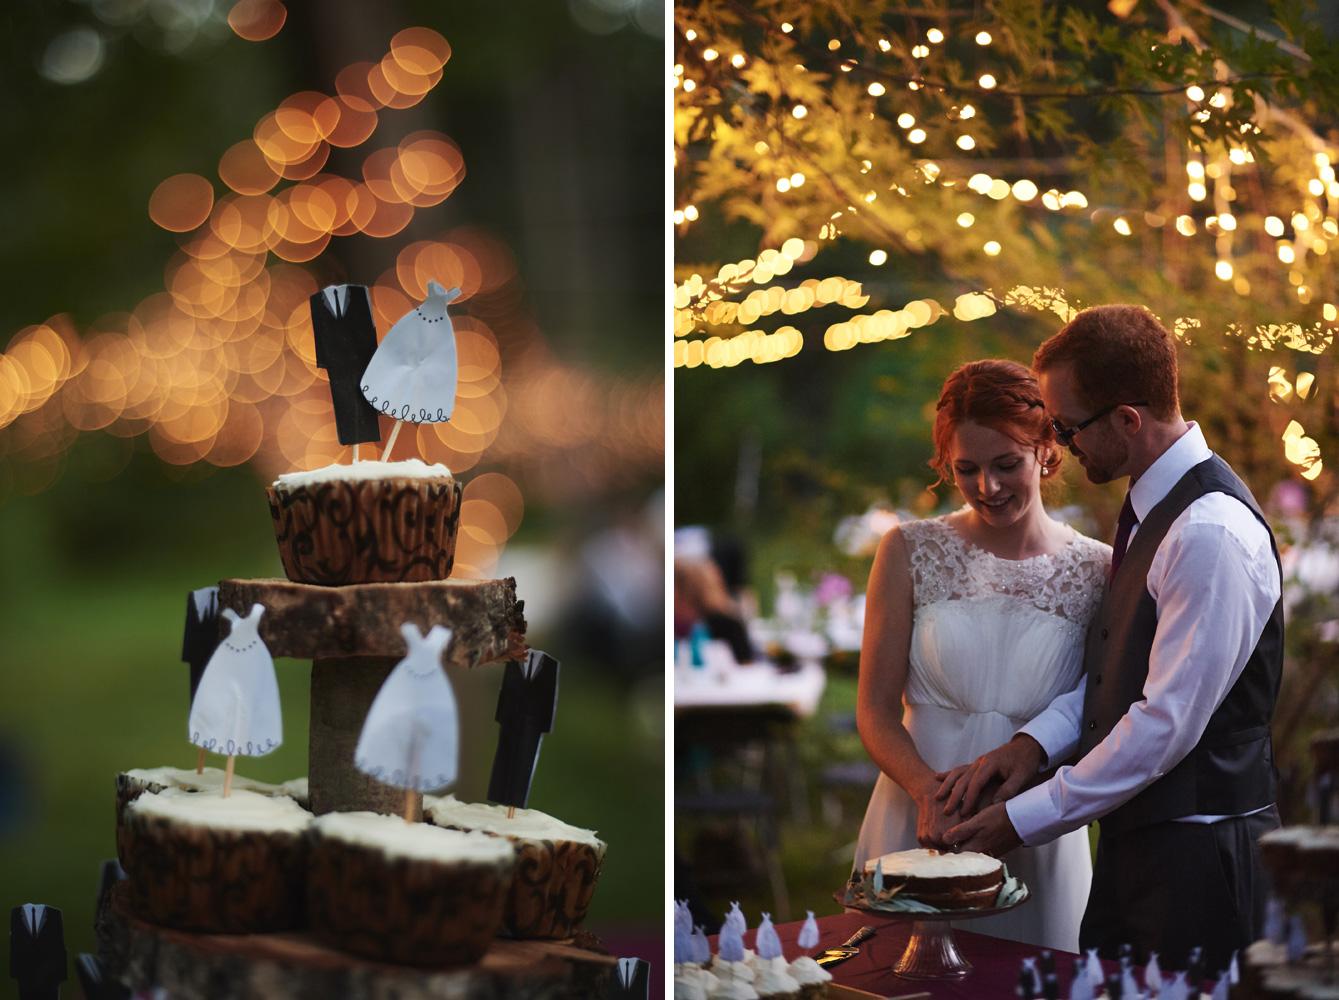 Bride-and-groom-cutting-the-cake.jpg